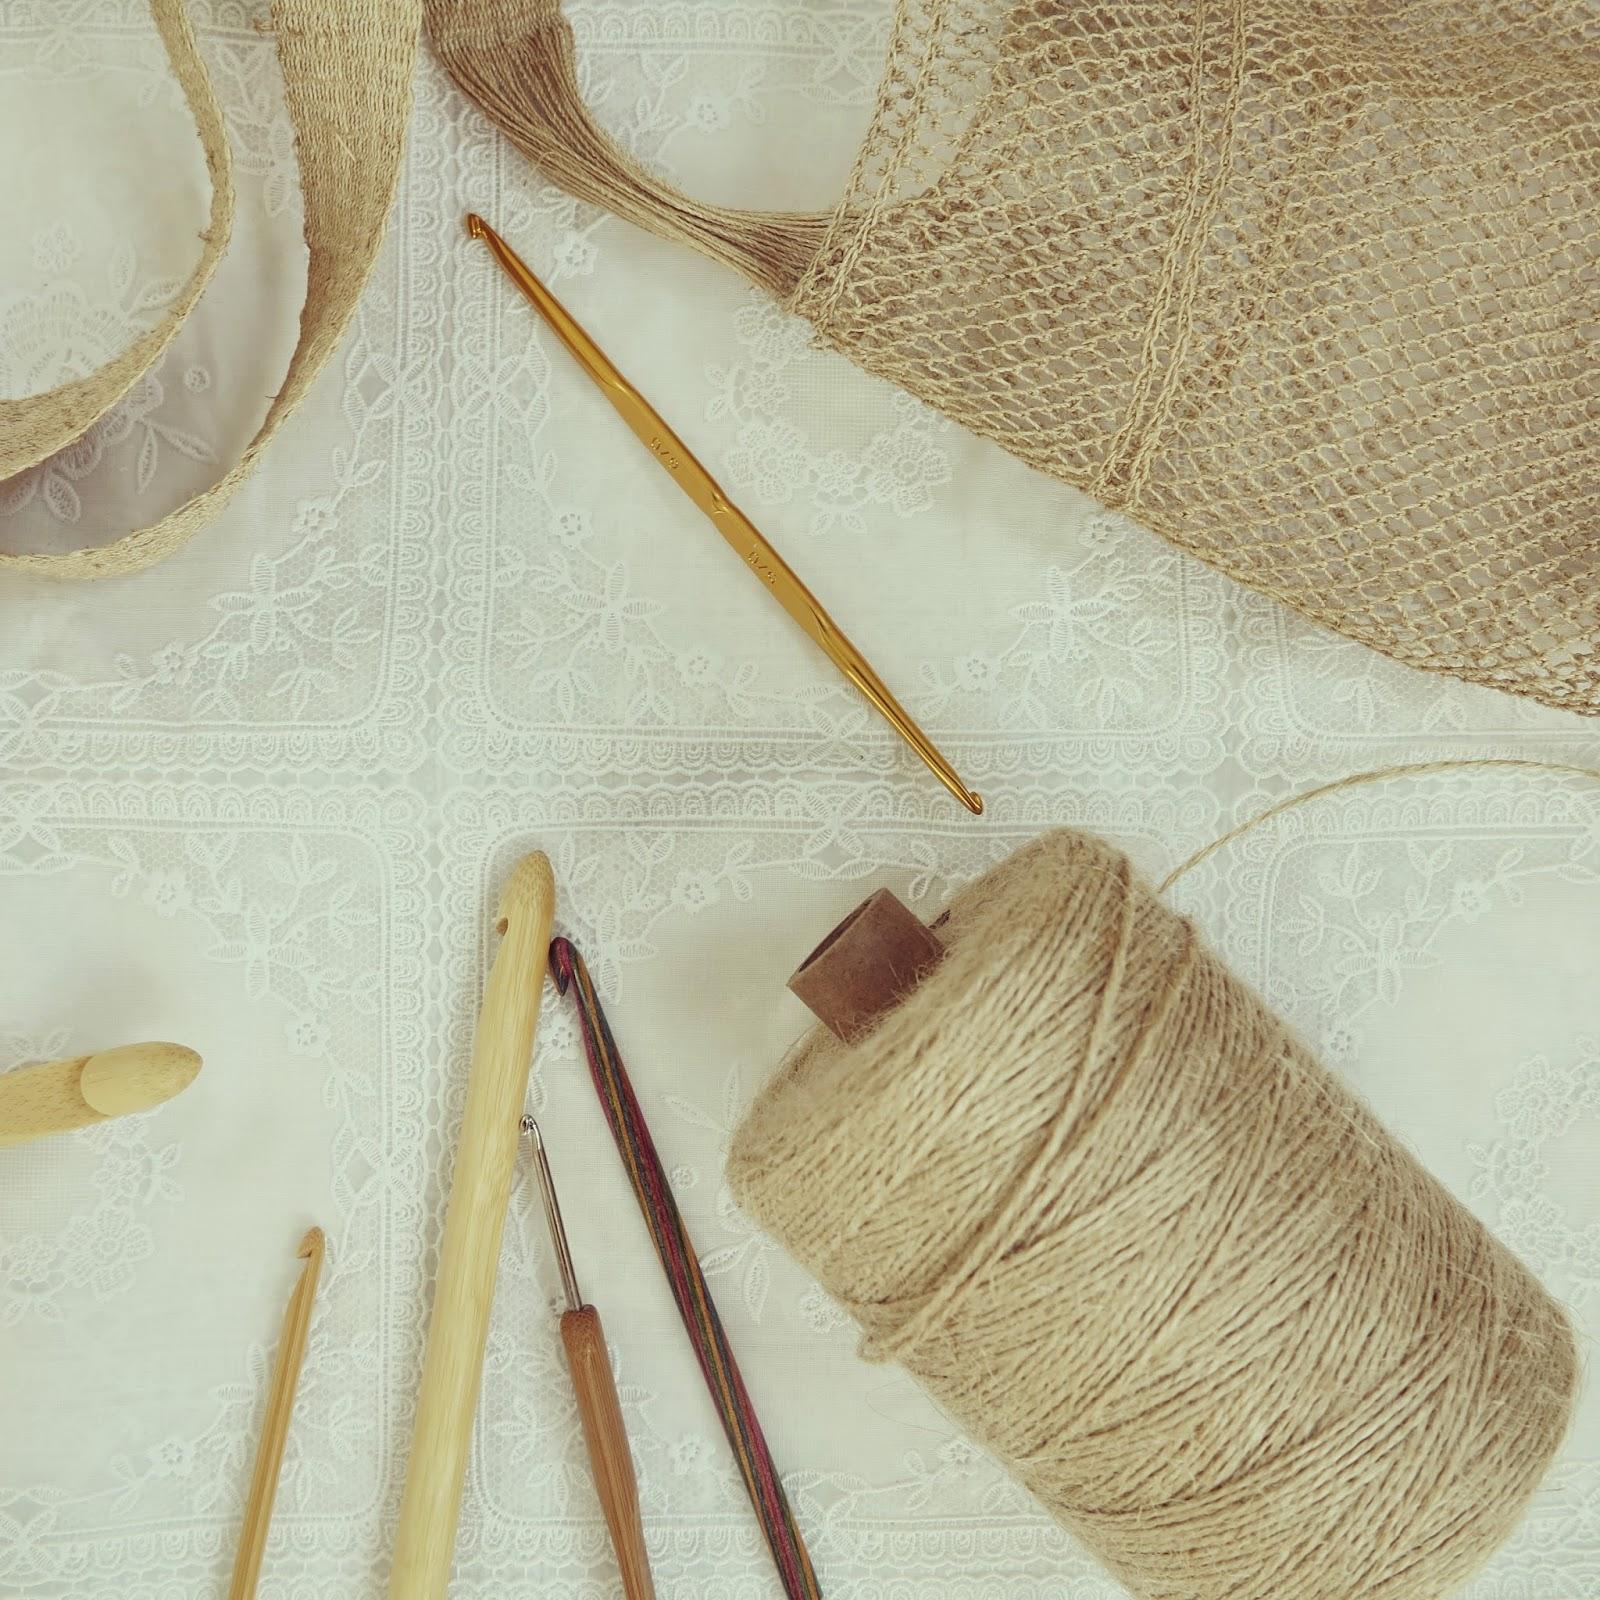 ByHaafner, twine, bamboo, natural fibres, crochet hooks